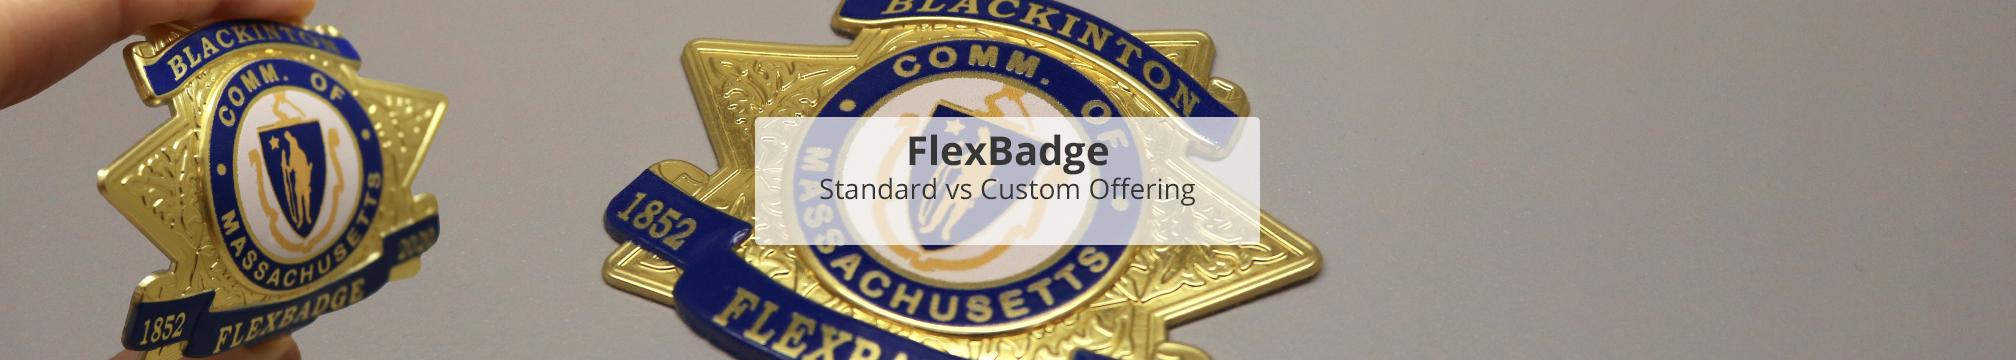 FlexBadge